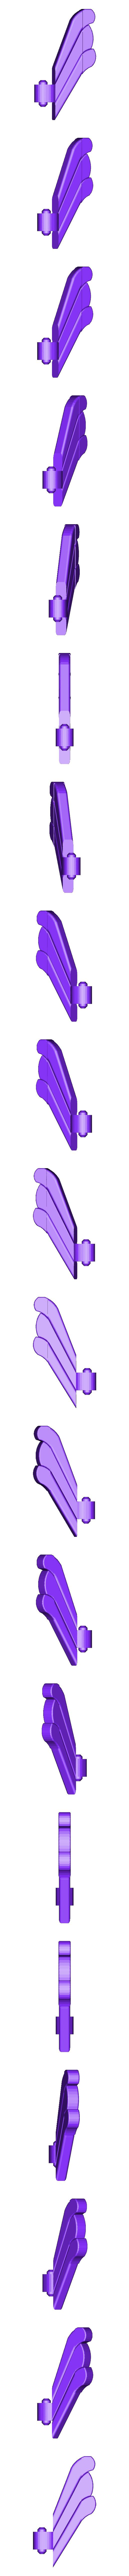 Armada_prime_super_mode_fins.stl Download free STL file Armada Optimus replacement parts • 3D printable template, Tfpivman